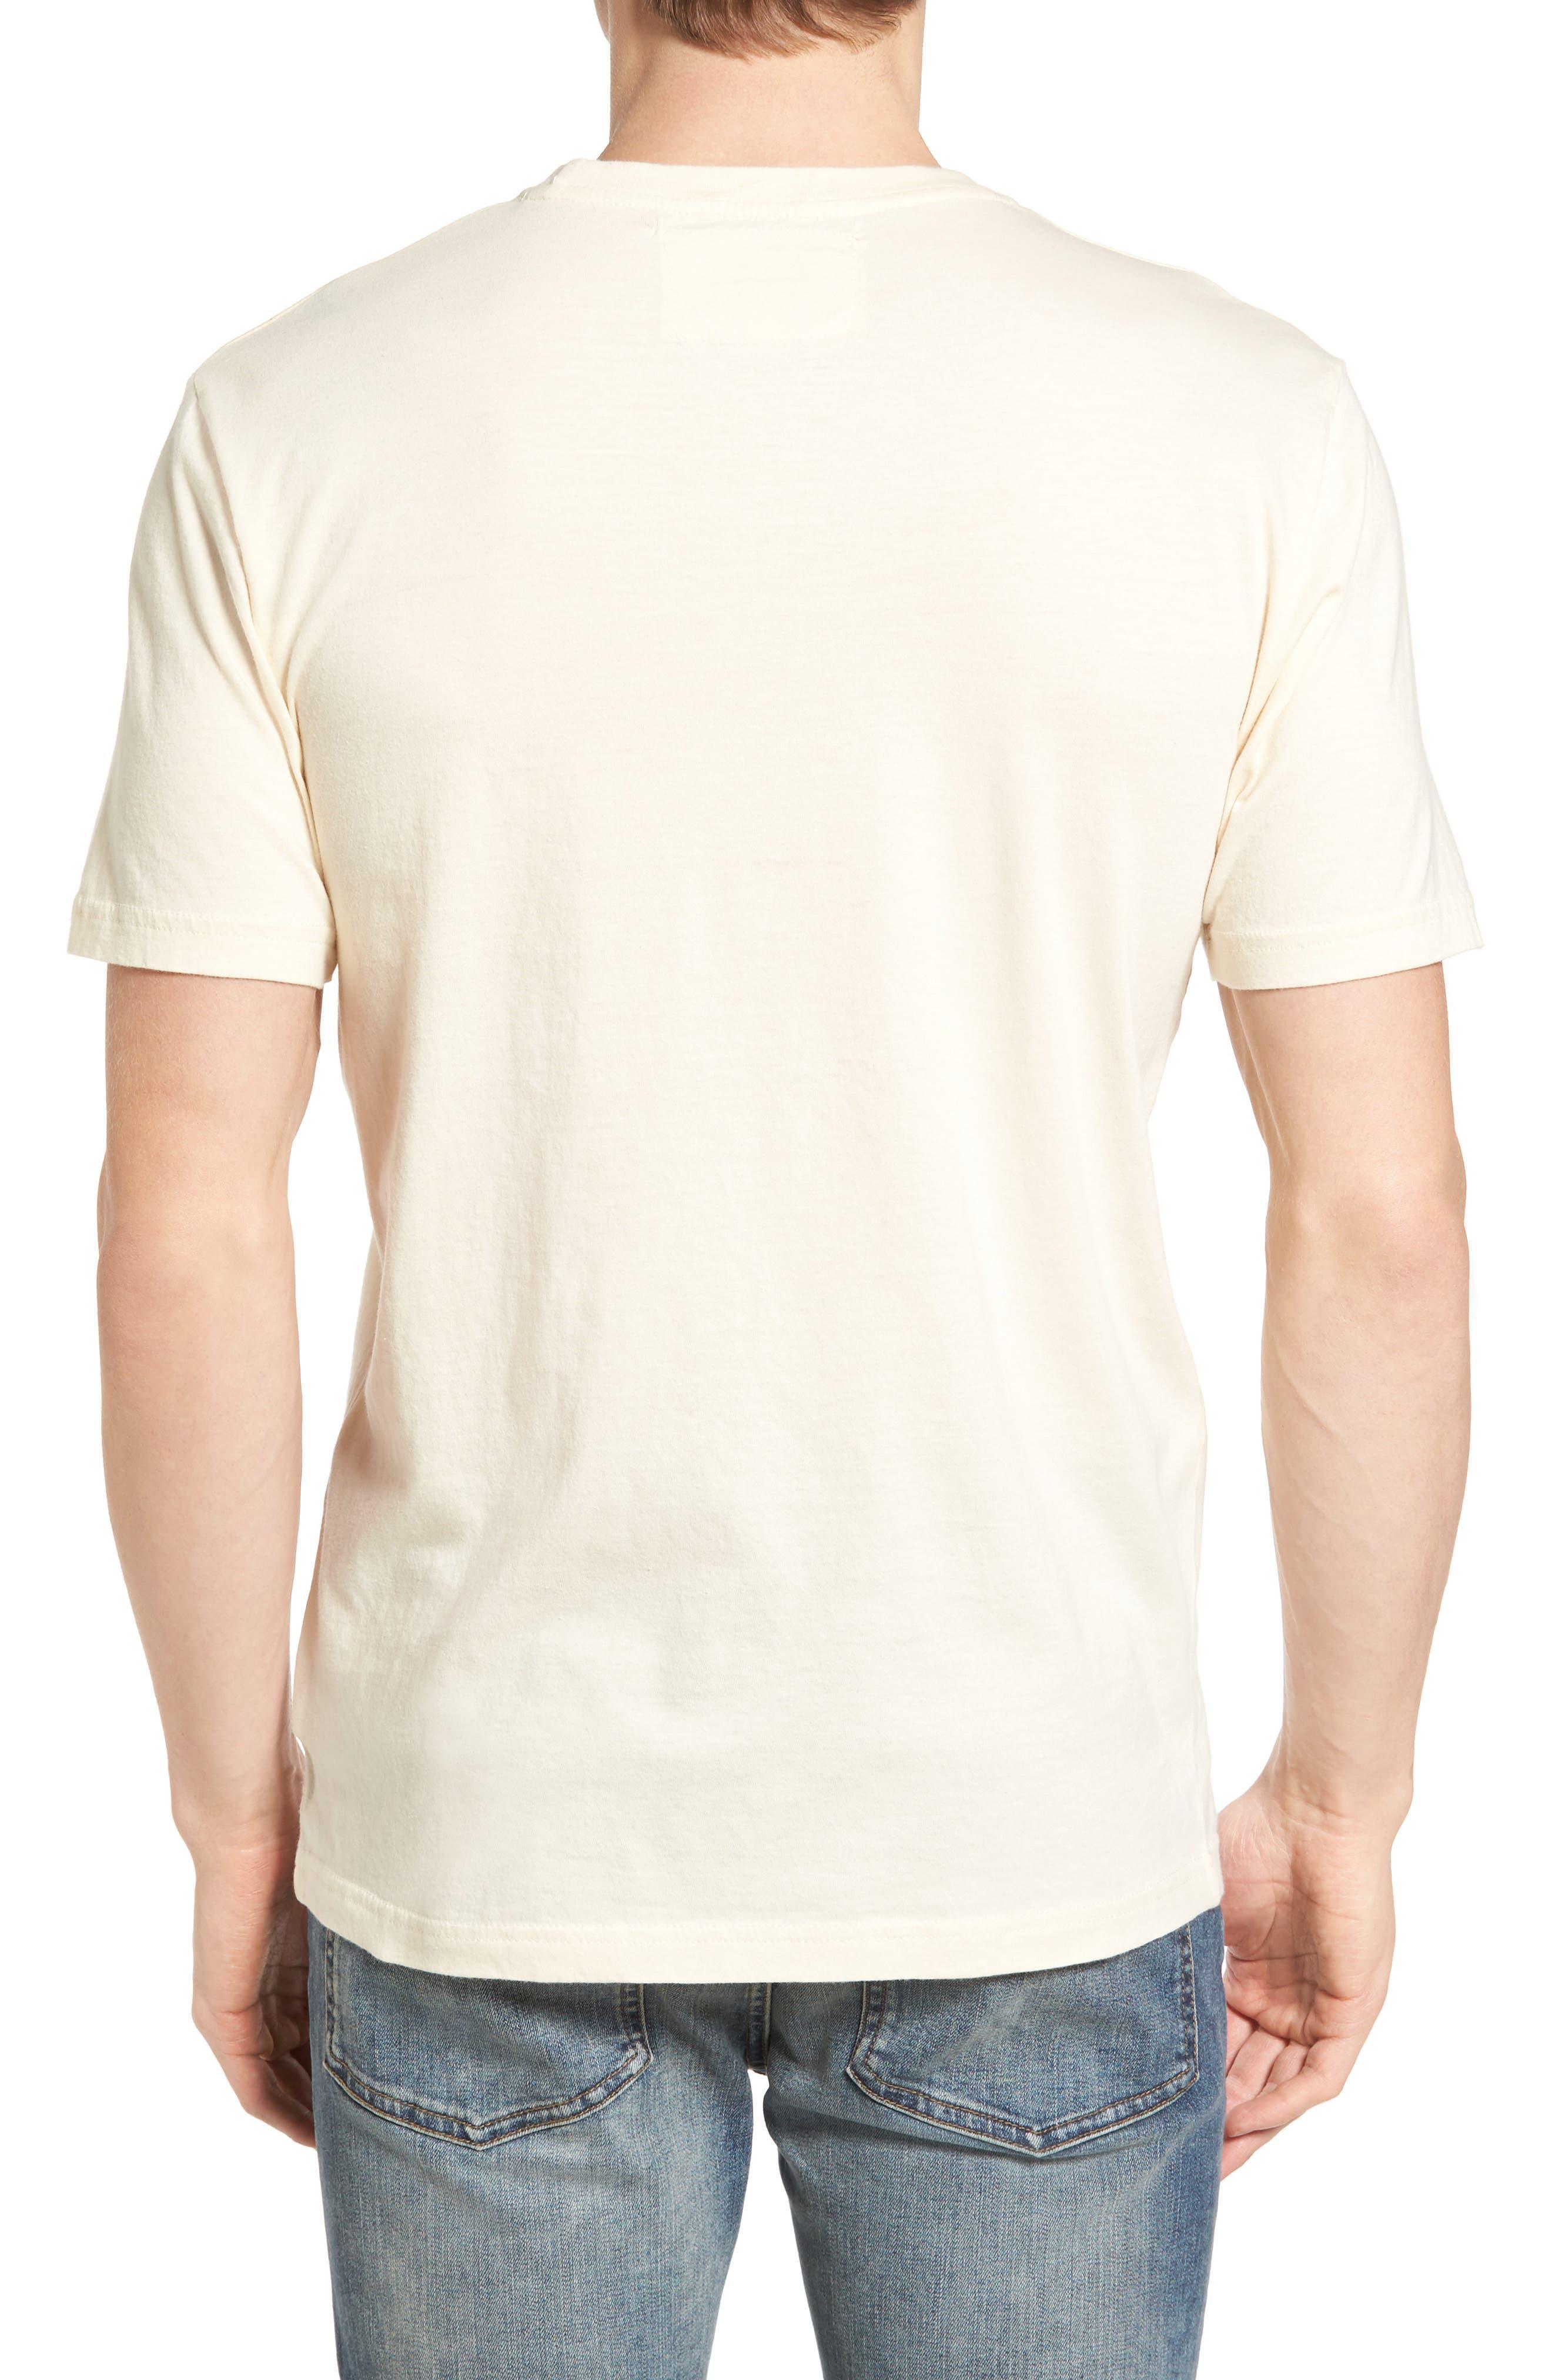 Brass Tack San Francisco Giants T-Shirt,                             Alternate thumbnail 2, color,                             124